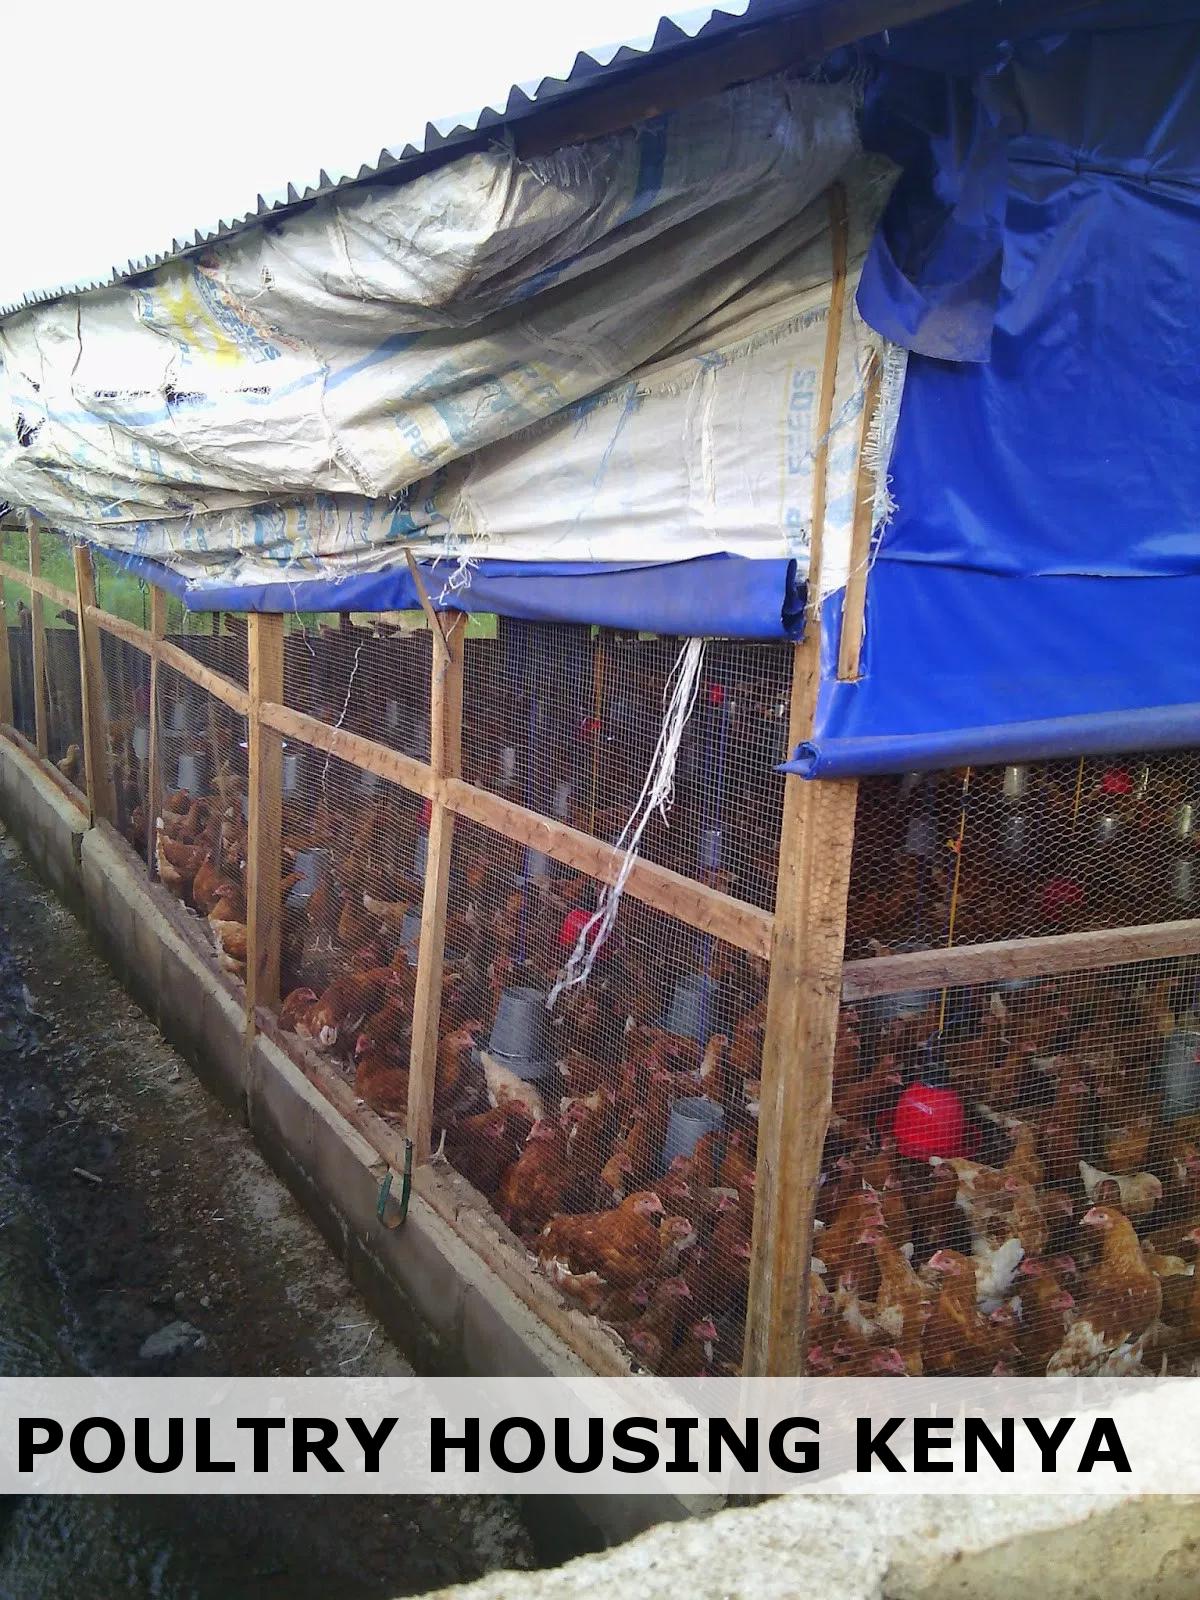 1000 layer poultry farm in Kenya | Poultry Housing Design